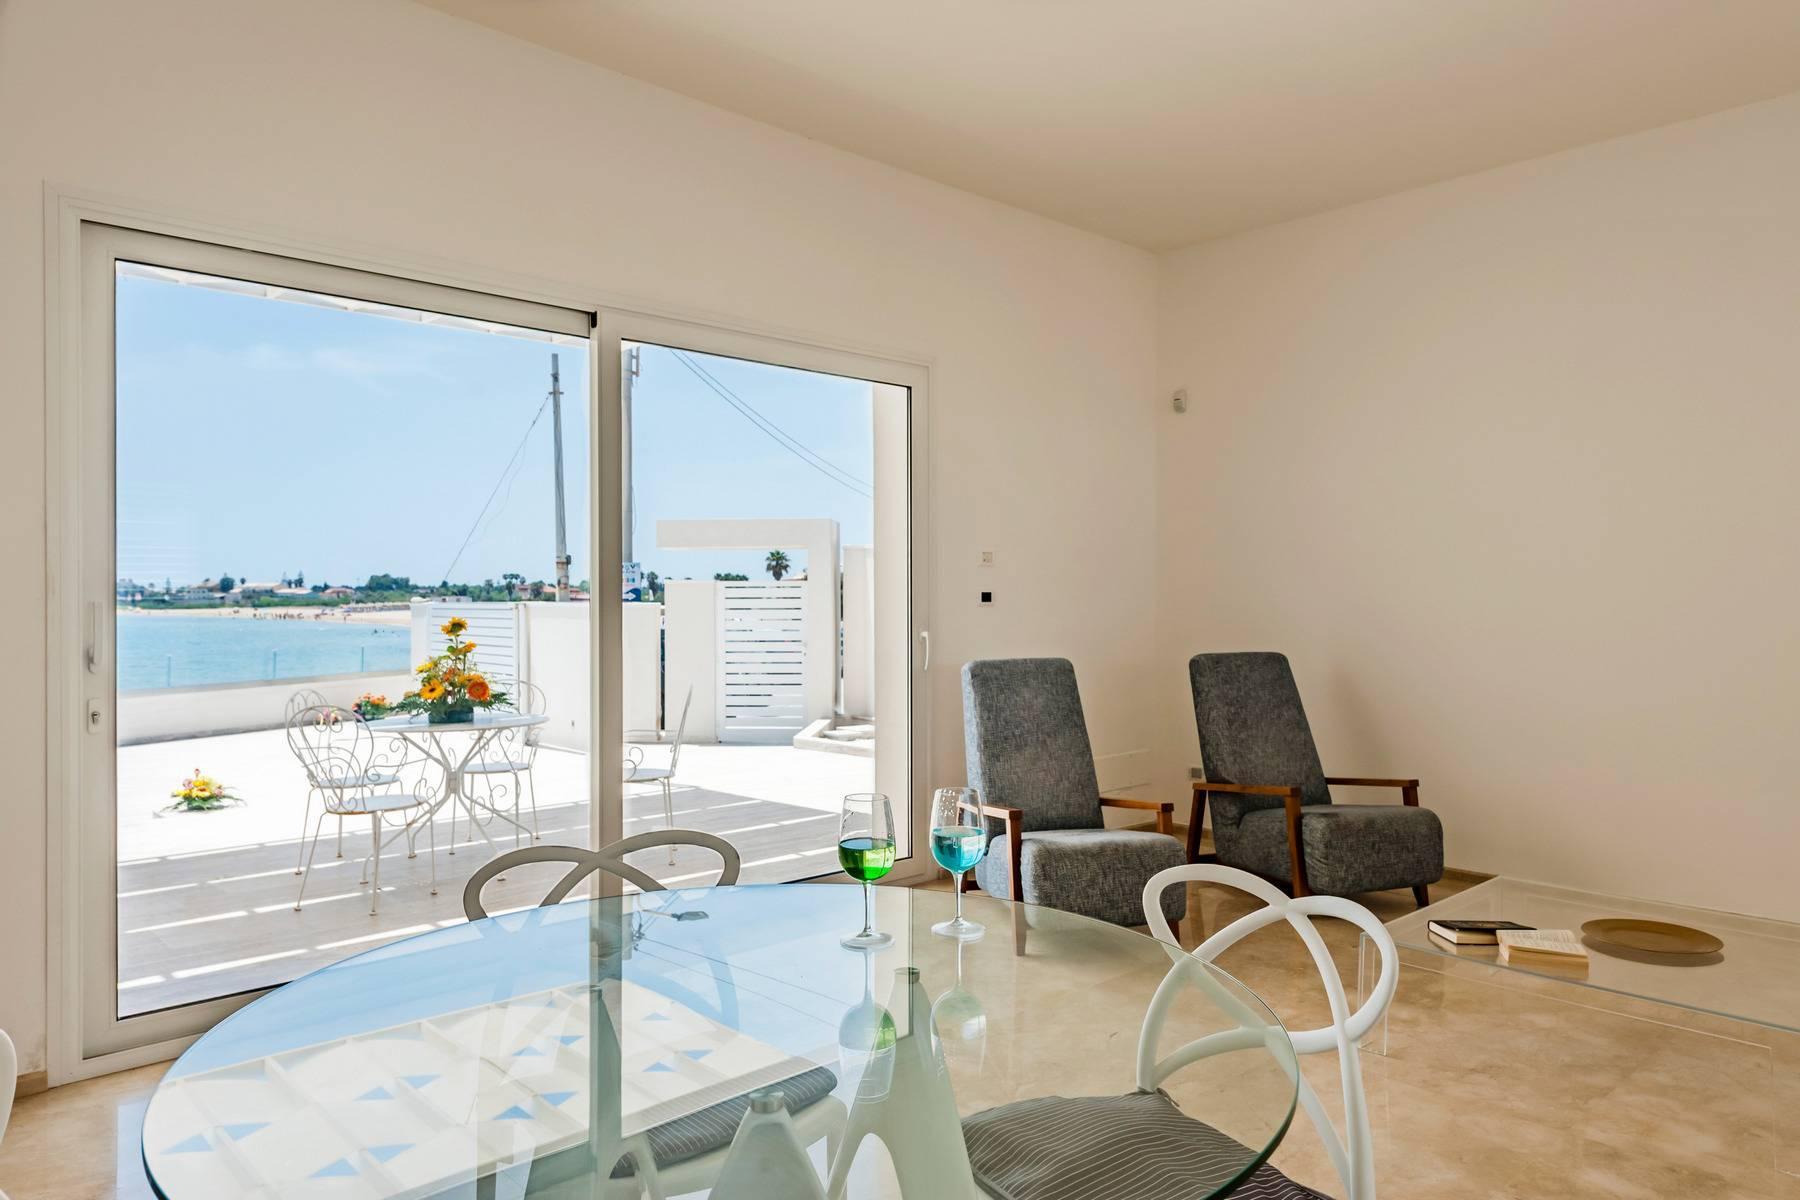 Exclusive villa with sea view in Avola - 7